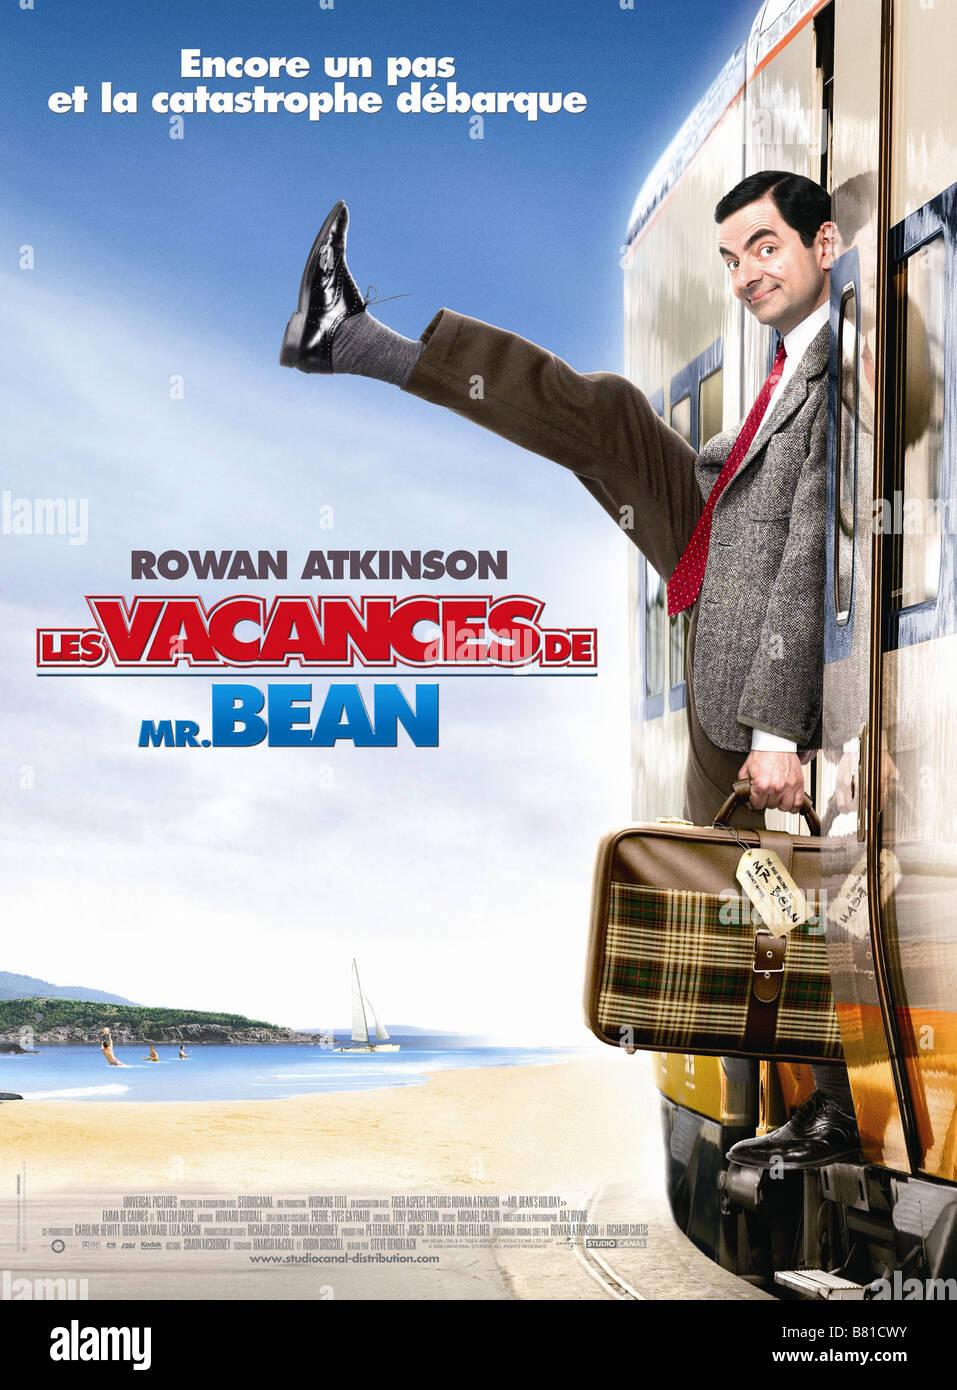 Mr. Bean's Holiday  Year: 2007 - UK Affiche / Poster Rowan Atkinson  Director: Steve Bendelack - Stock Image